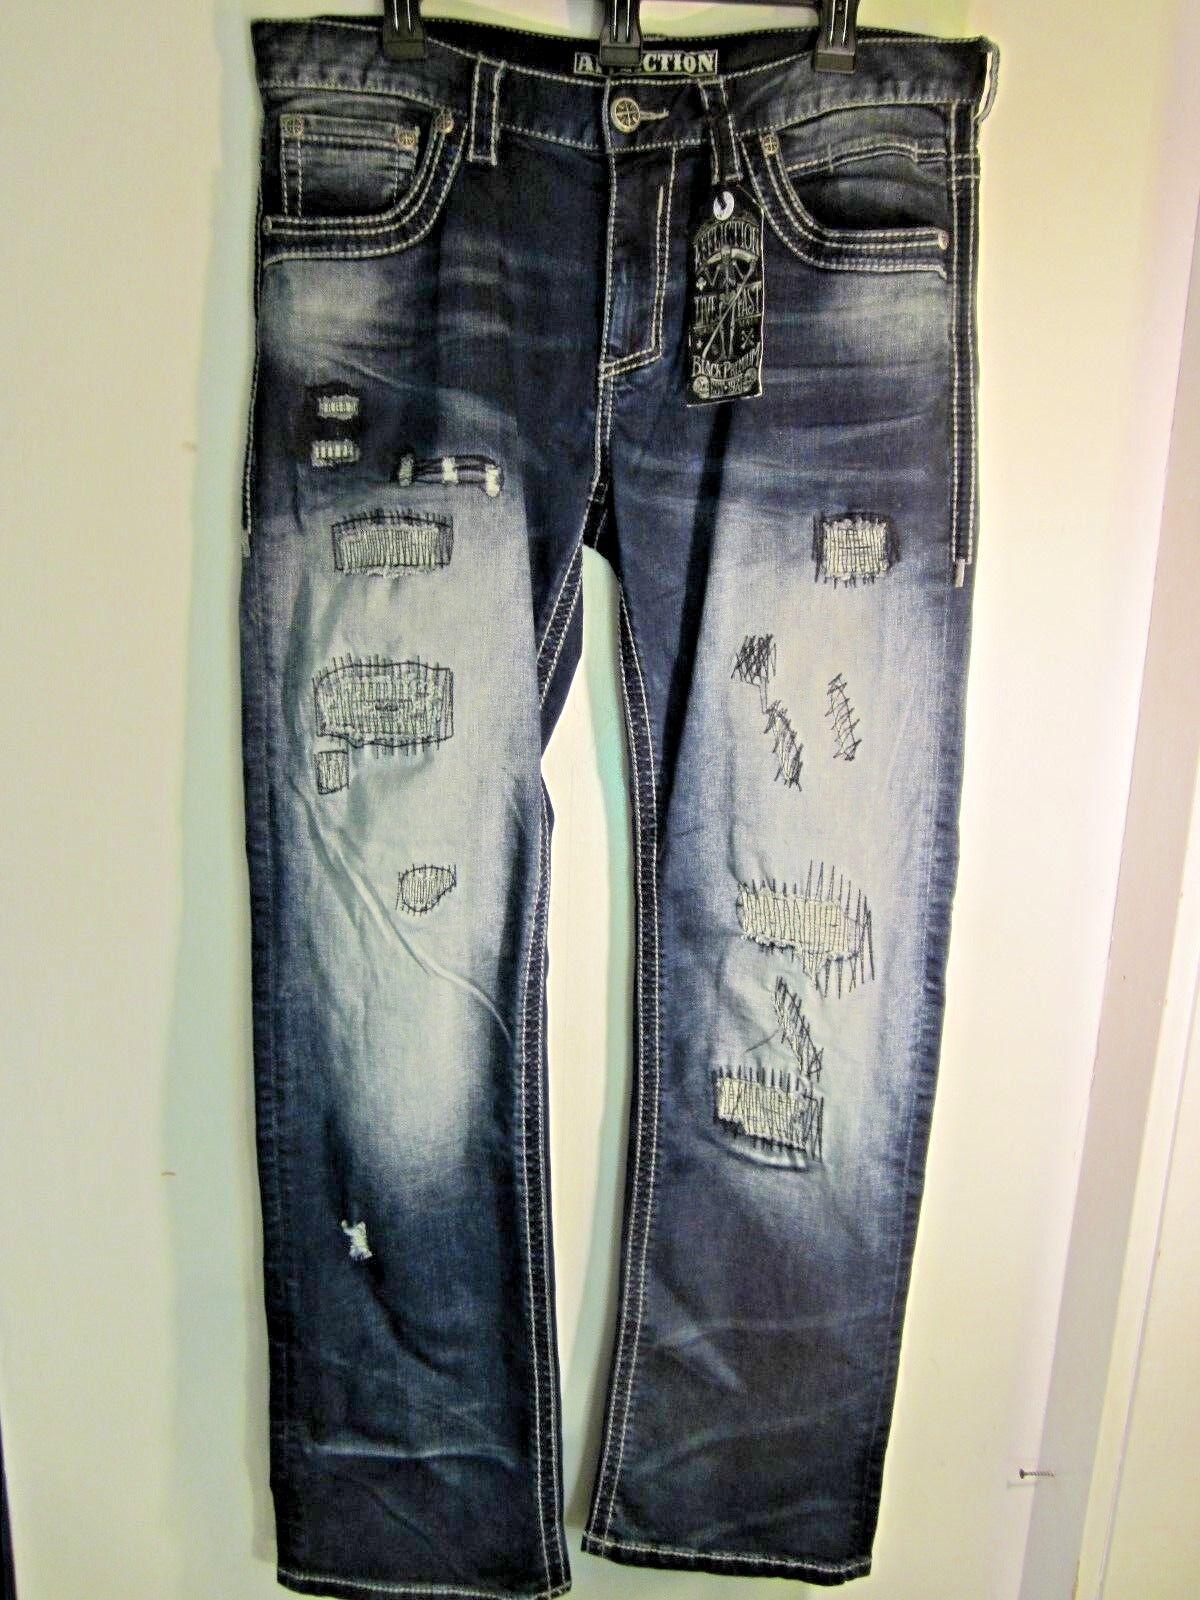 New AFFLICTION MEN'S  Blake Rising Critter Dark Destructed Denim Jeans Sz 34